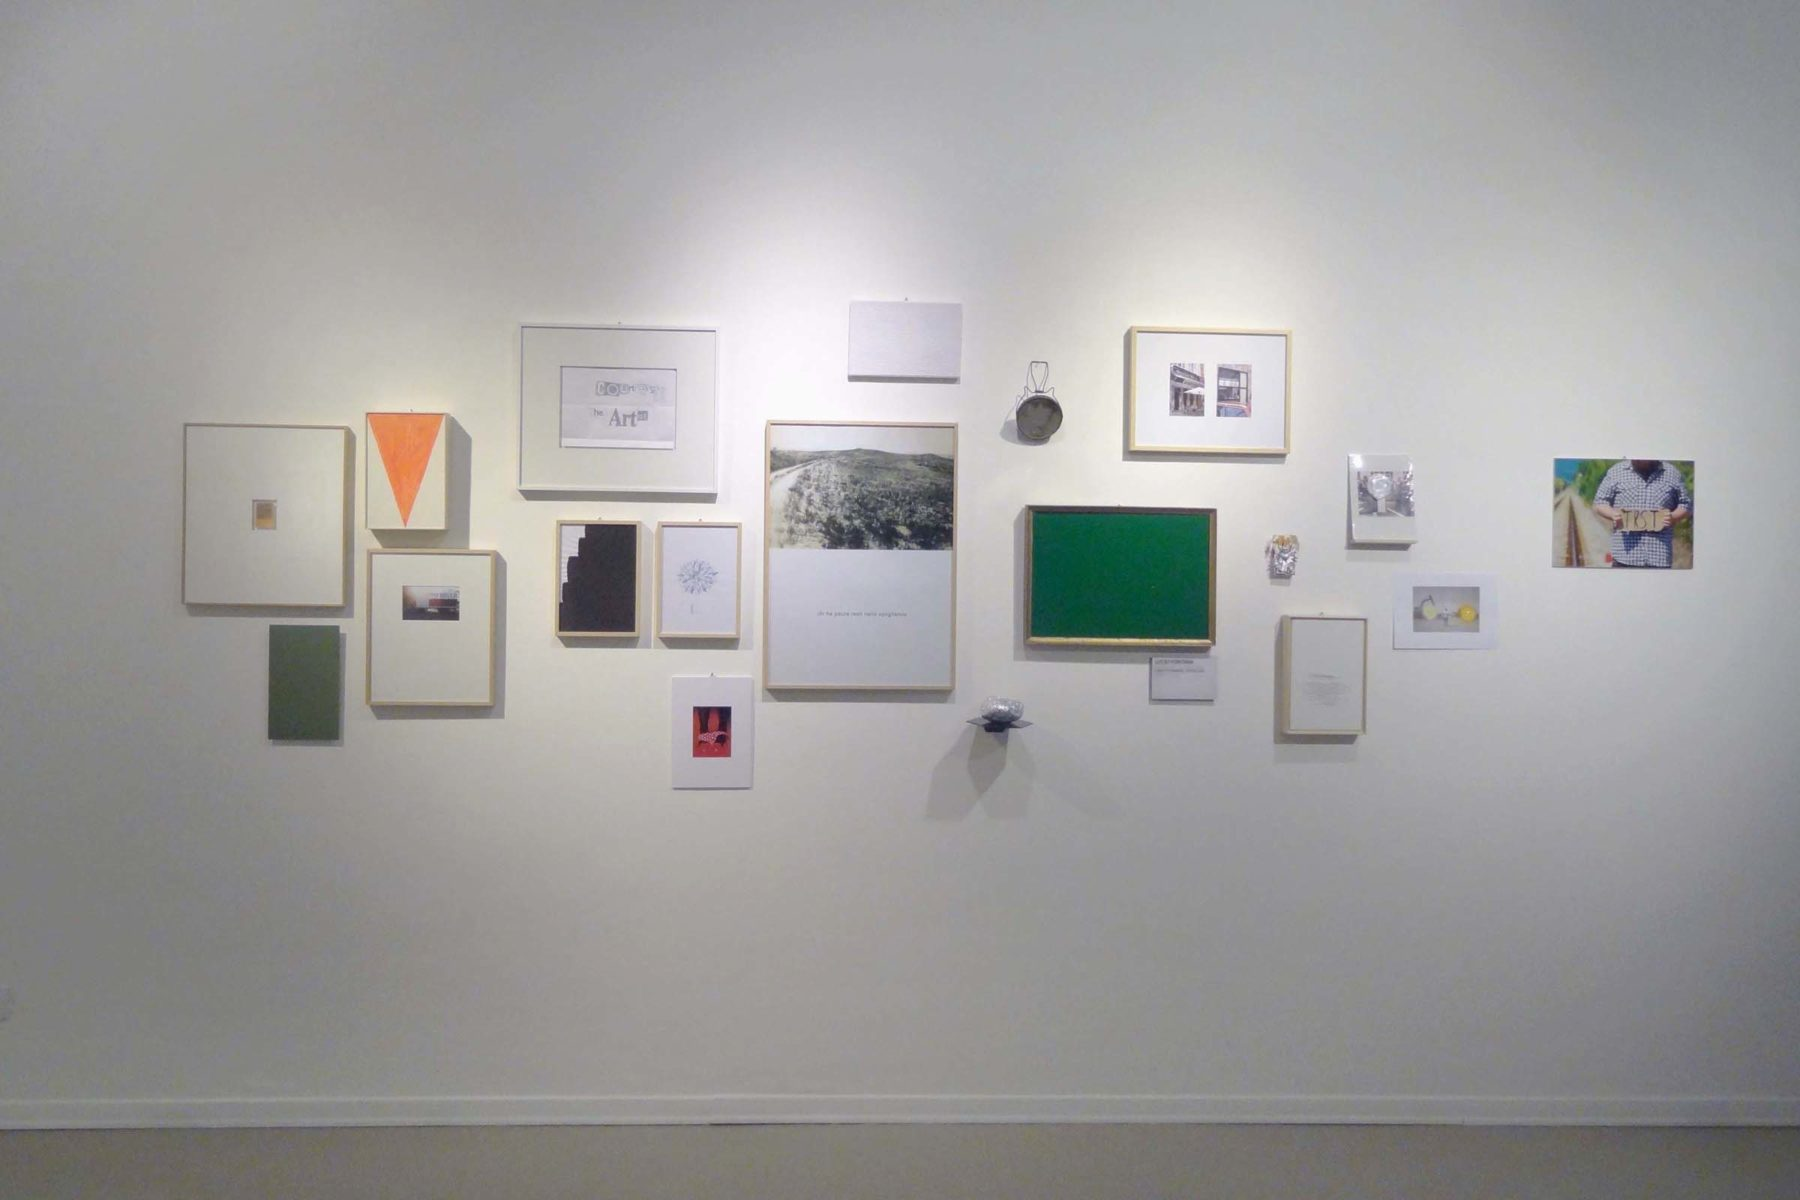 Matteo Attruia, Courtesy the Artist, 2012, installation, view at LipanjePuntin ArteContemporanea, Trieste